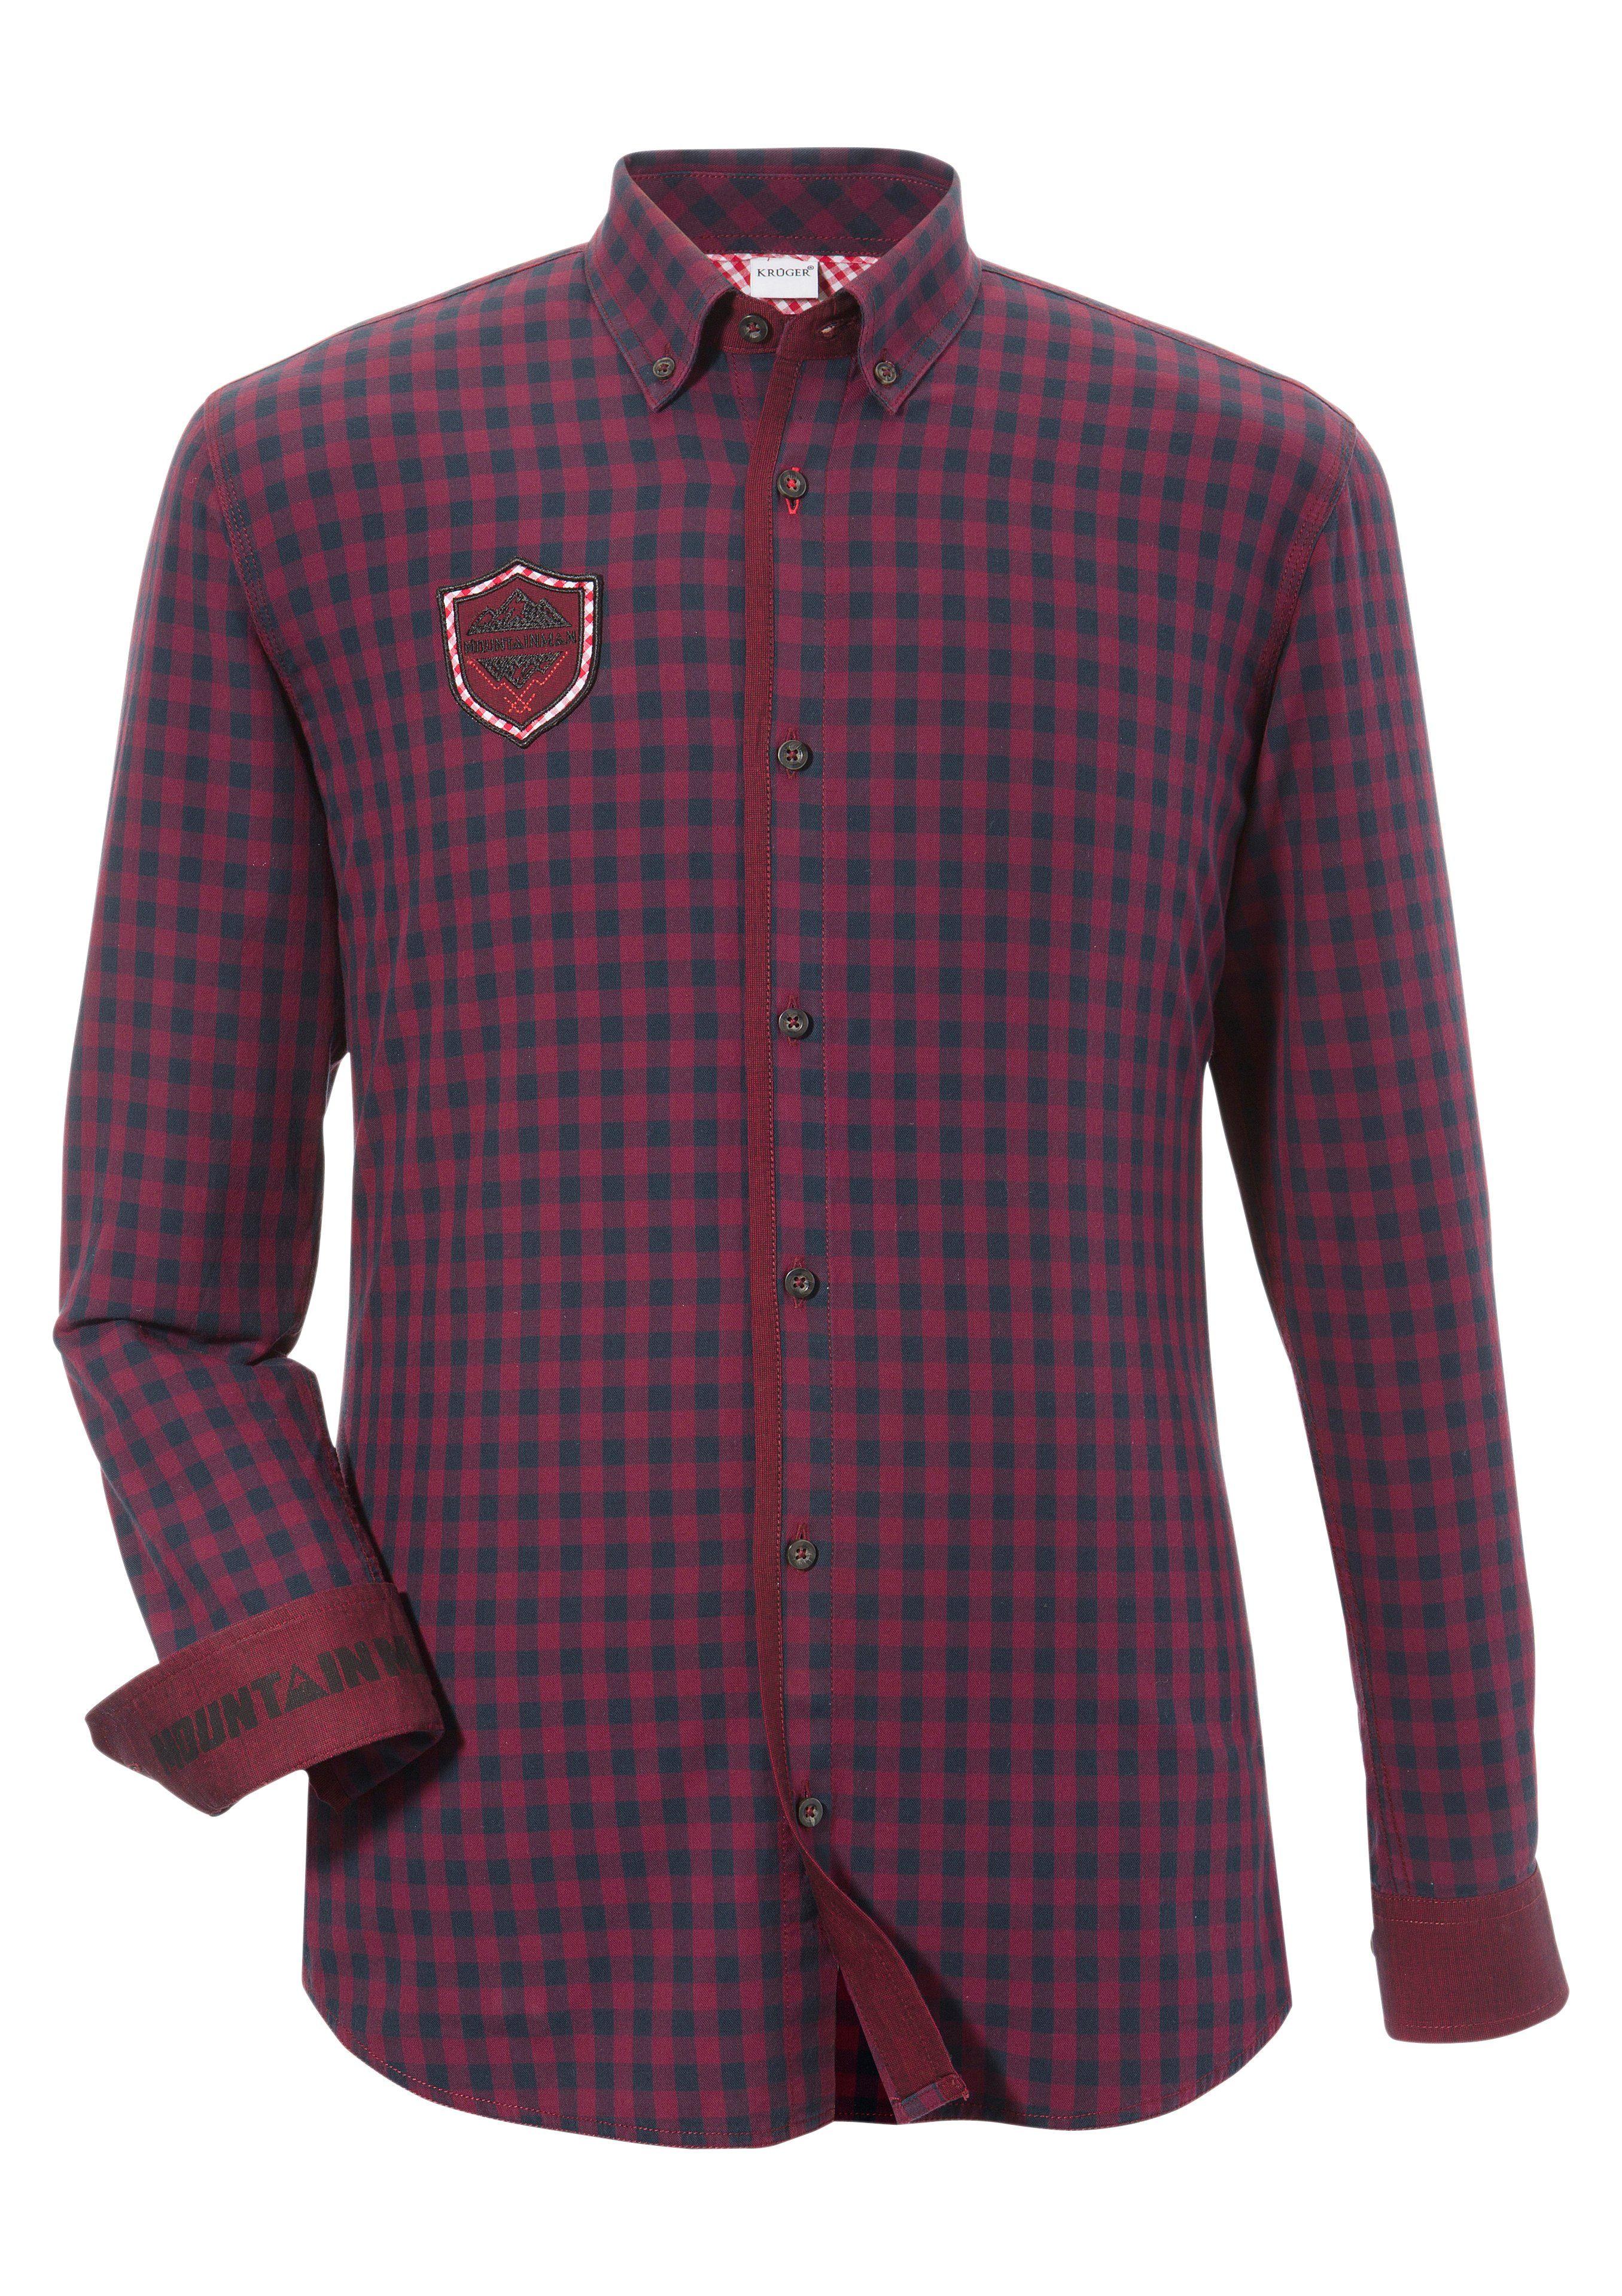 Andreas Gabalier Kollektion Trachtenhemd mit rockiger Applikation   Bekleidung > Hemden > Trachtenhemden   Andreas Gabalier Kollektion